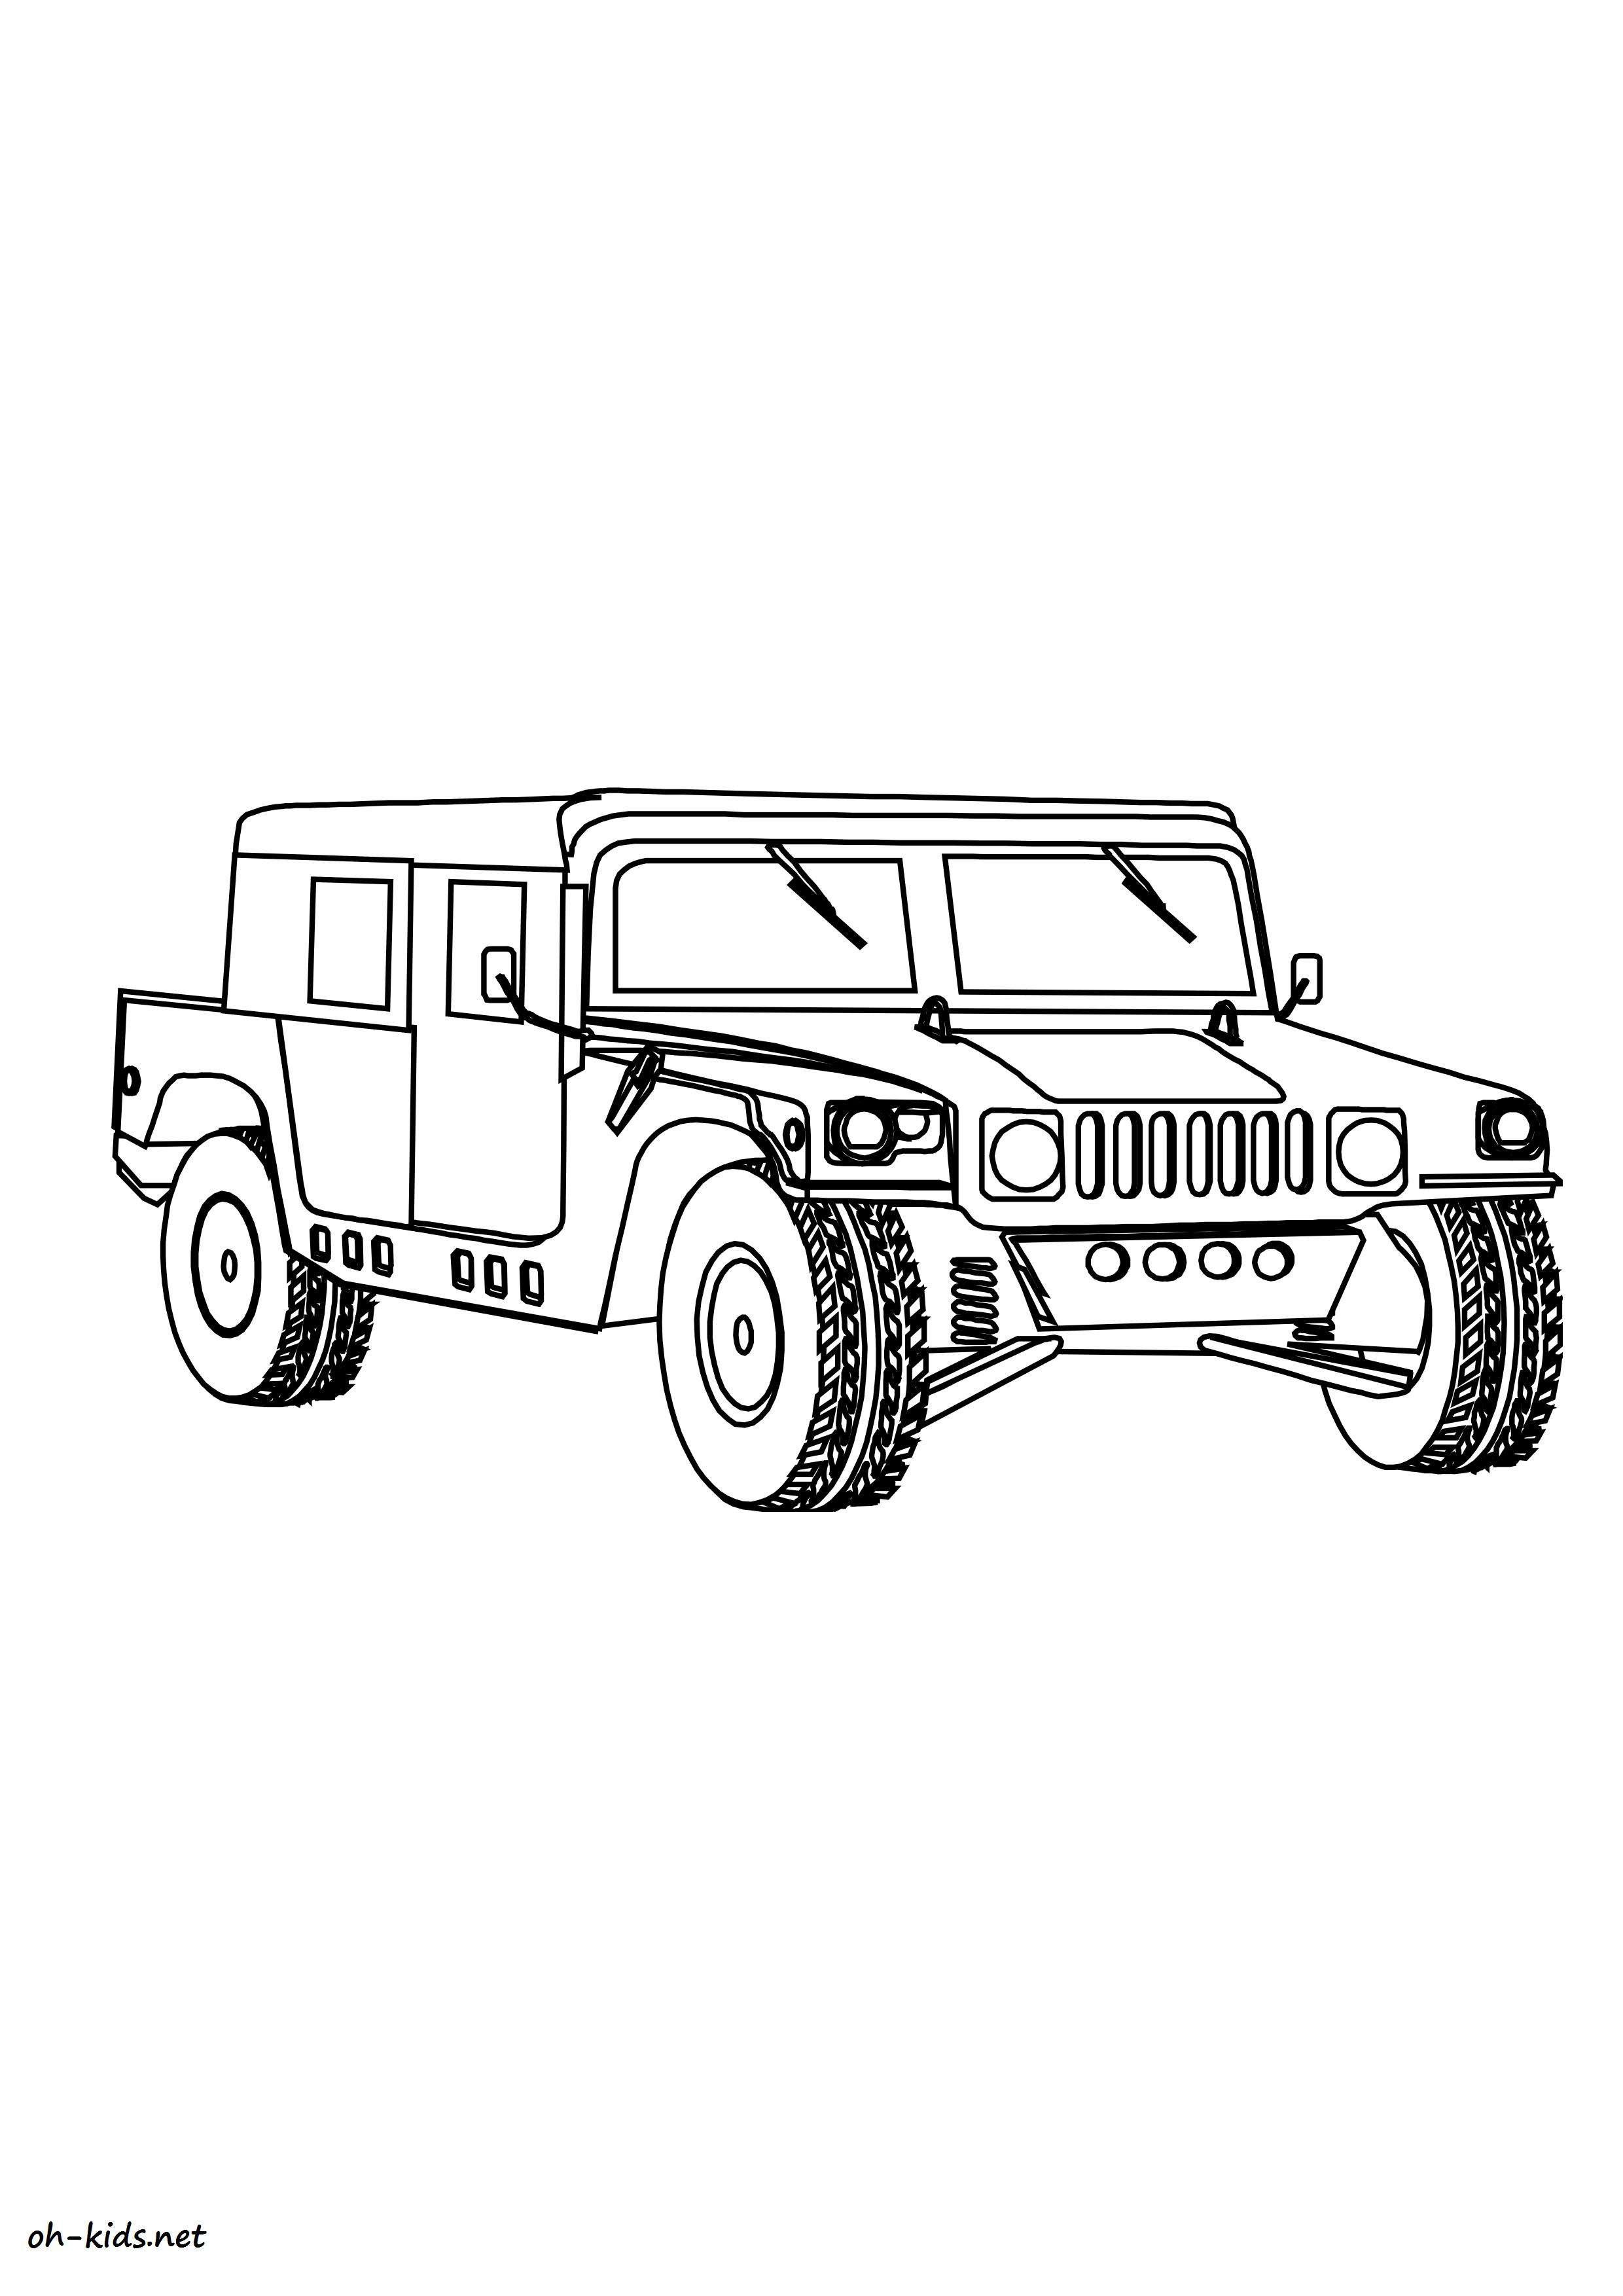 dessin de automobile a imprimer - Dessin #1431